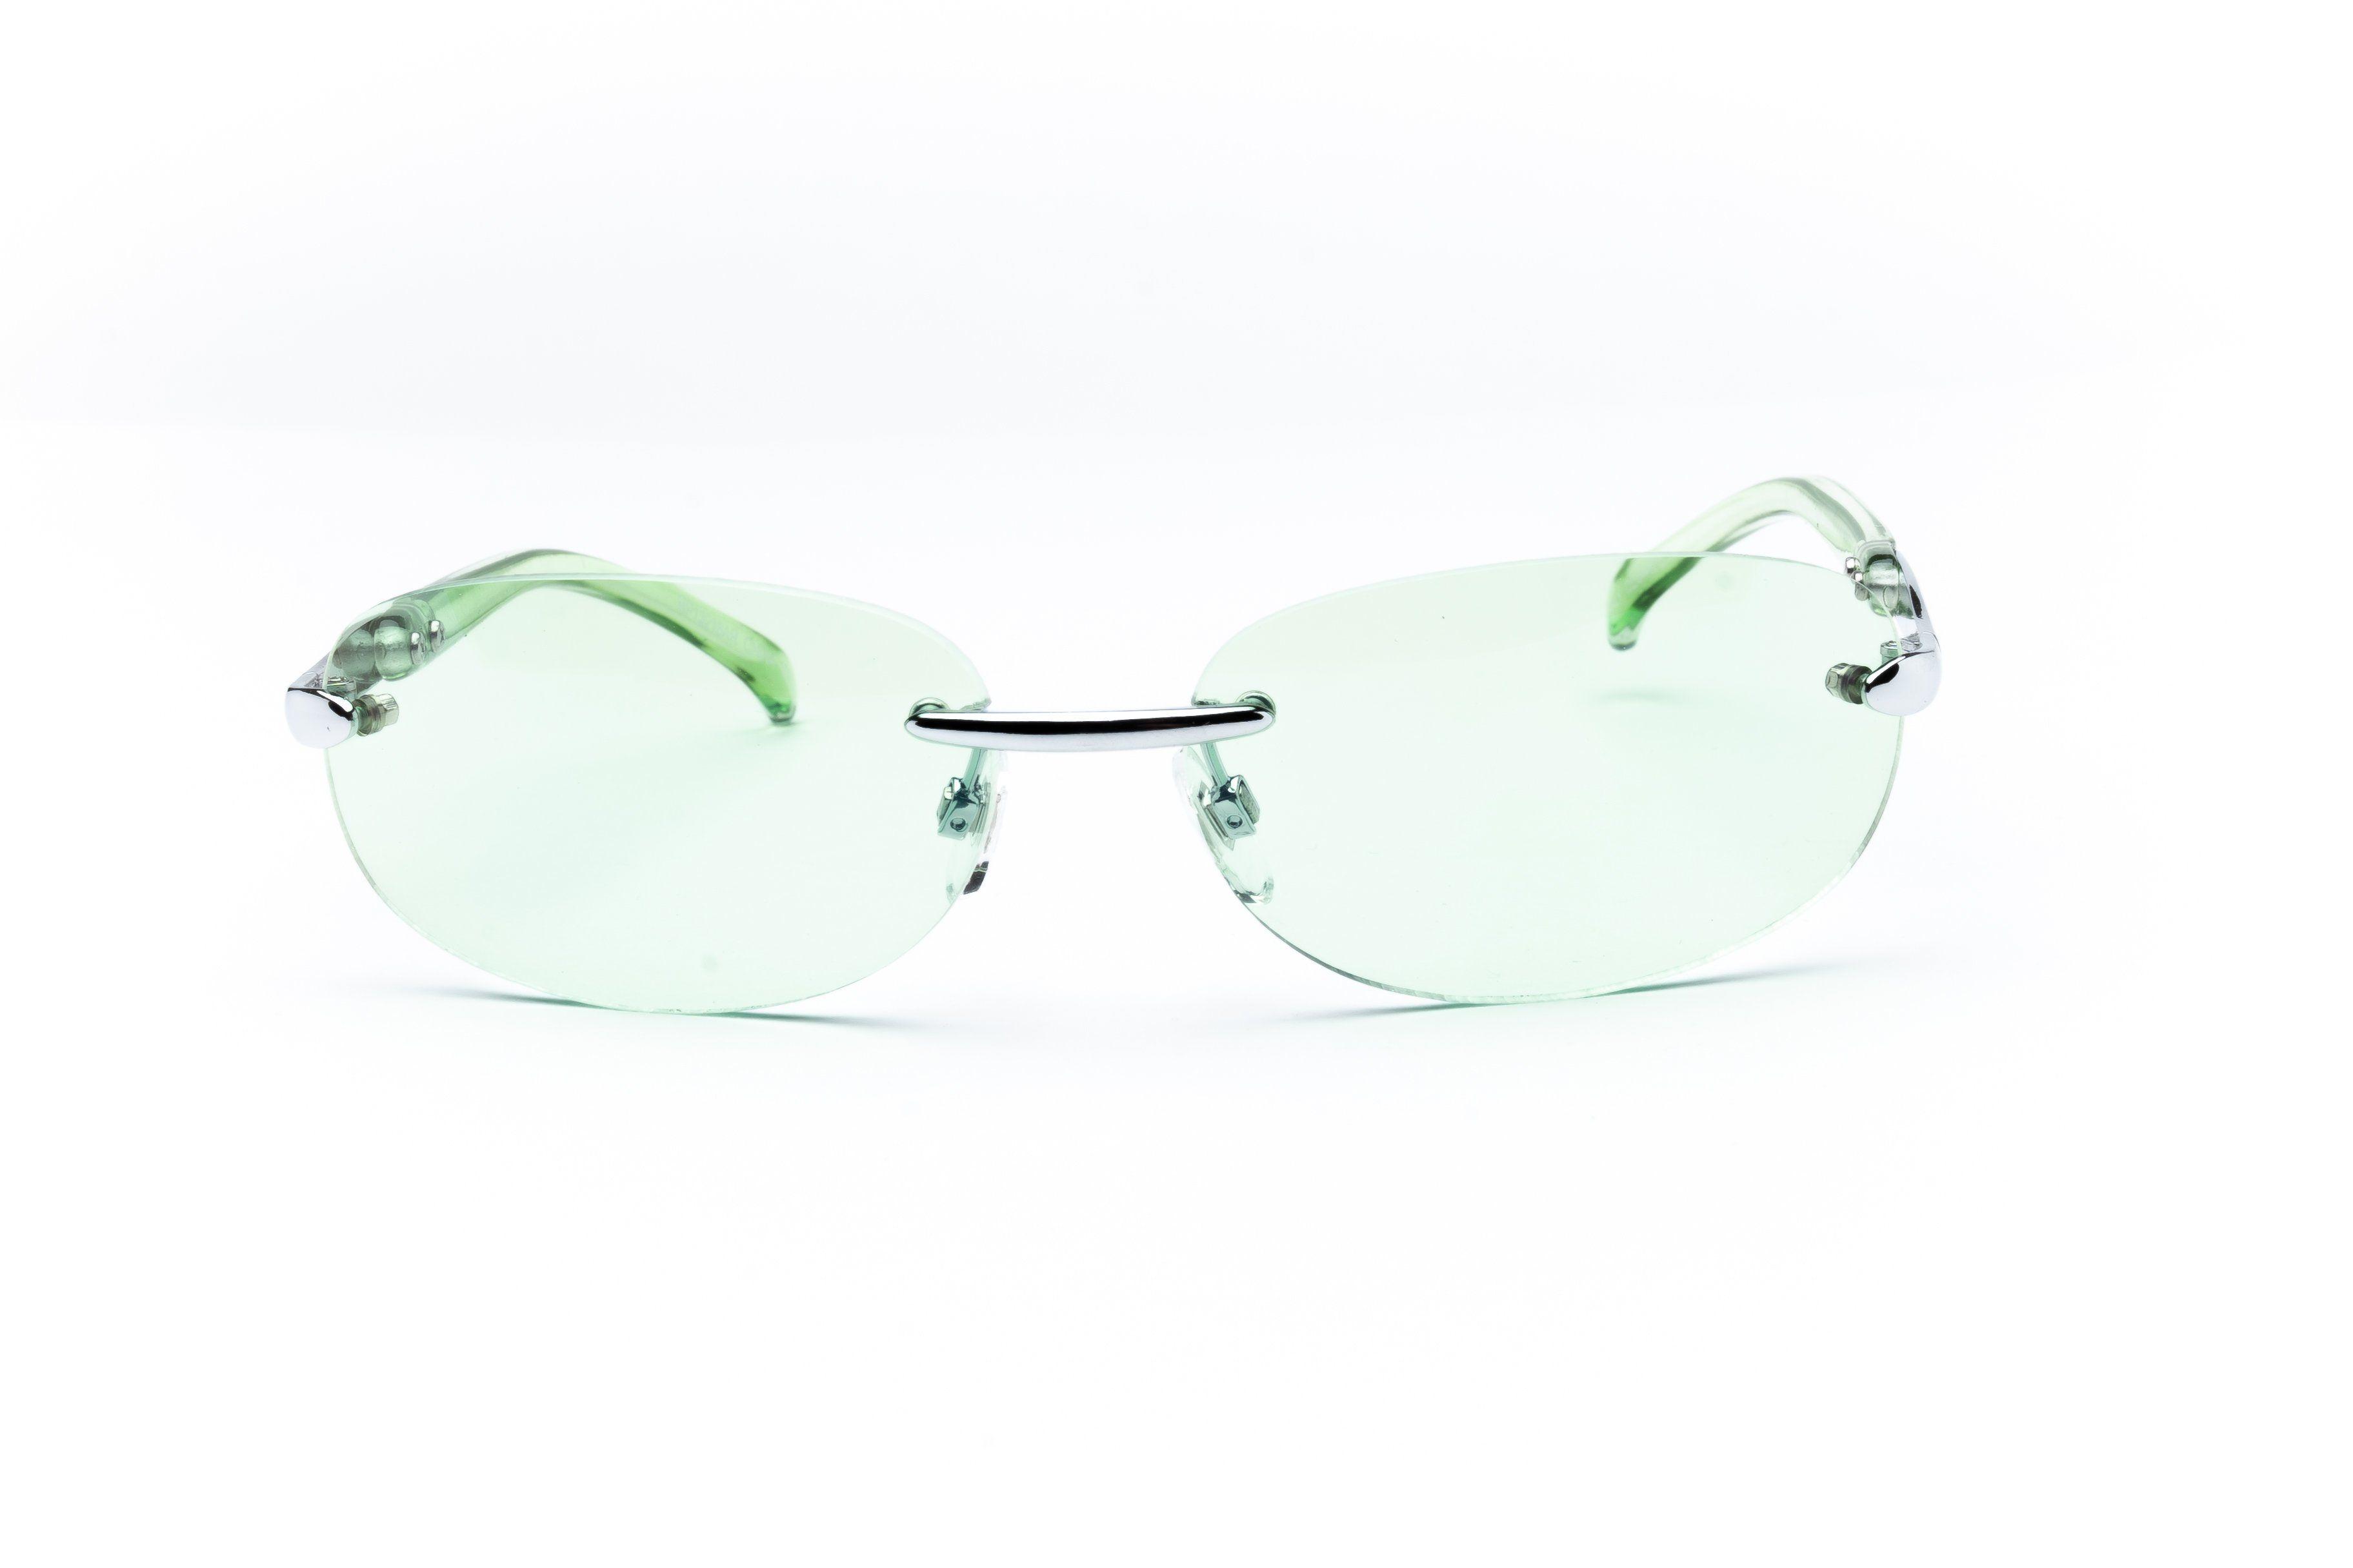 """Uncut Gems"" 2000's Y2K Vintage Oval Sunglasses"